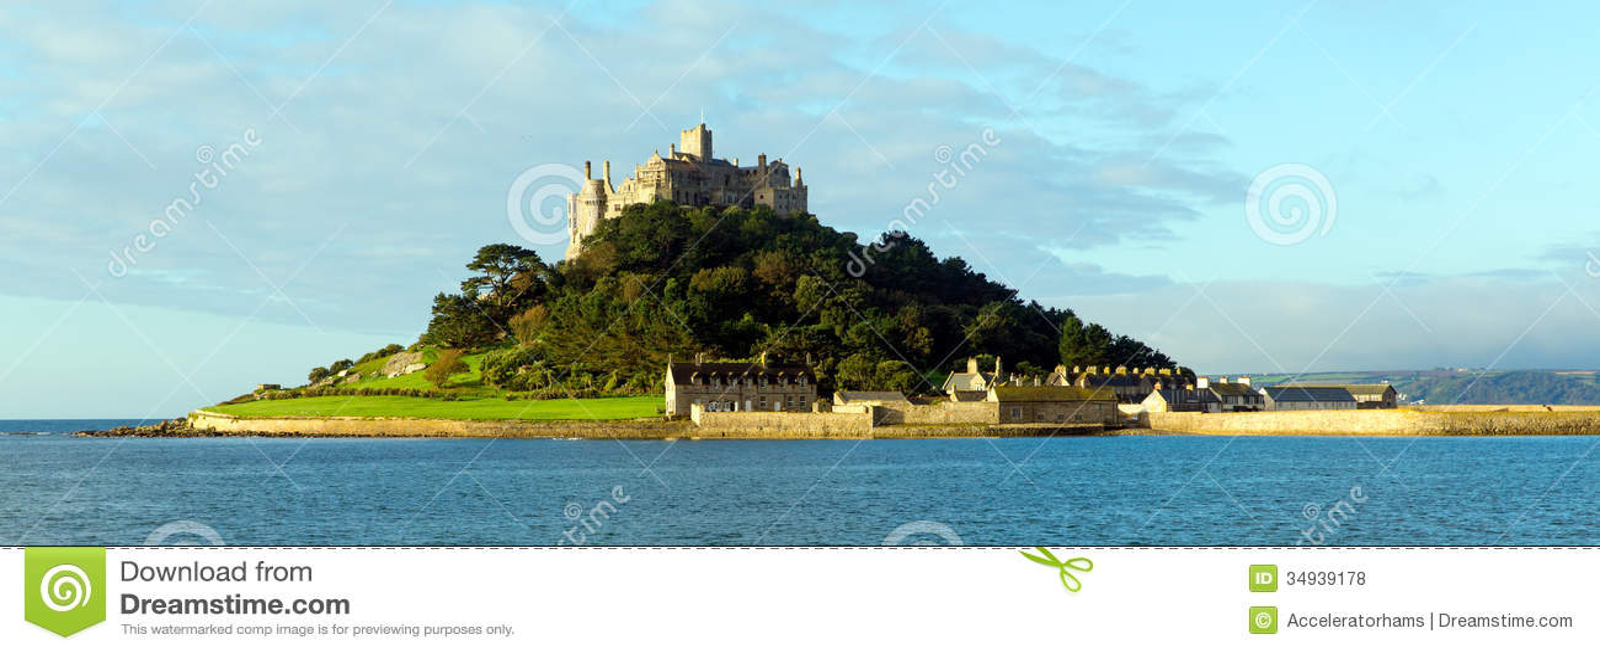 St Michaels Mount Marazion Cornwall England